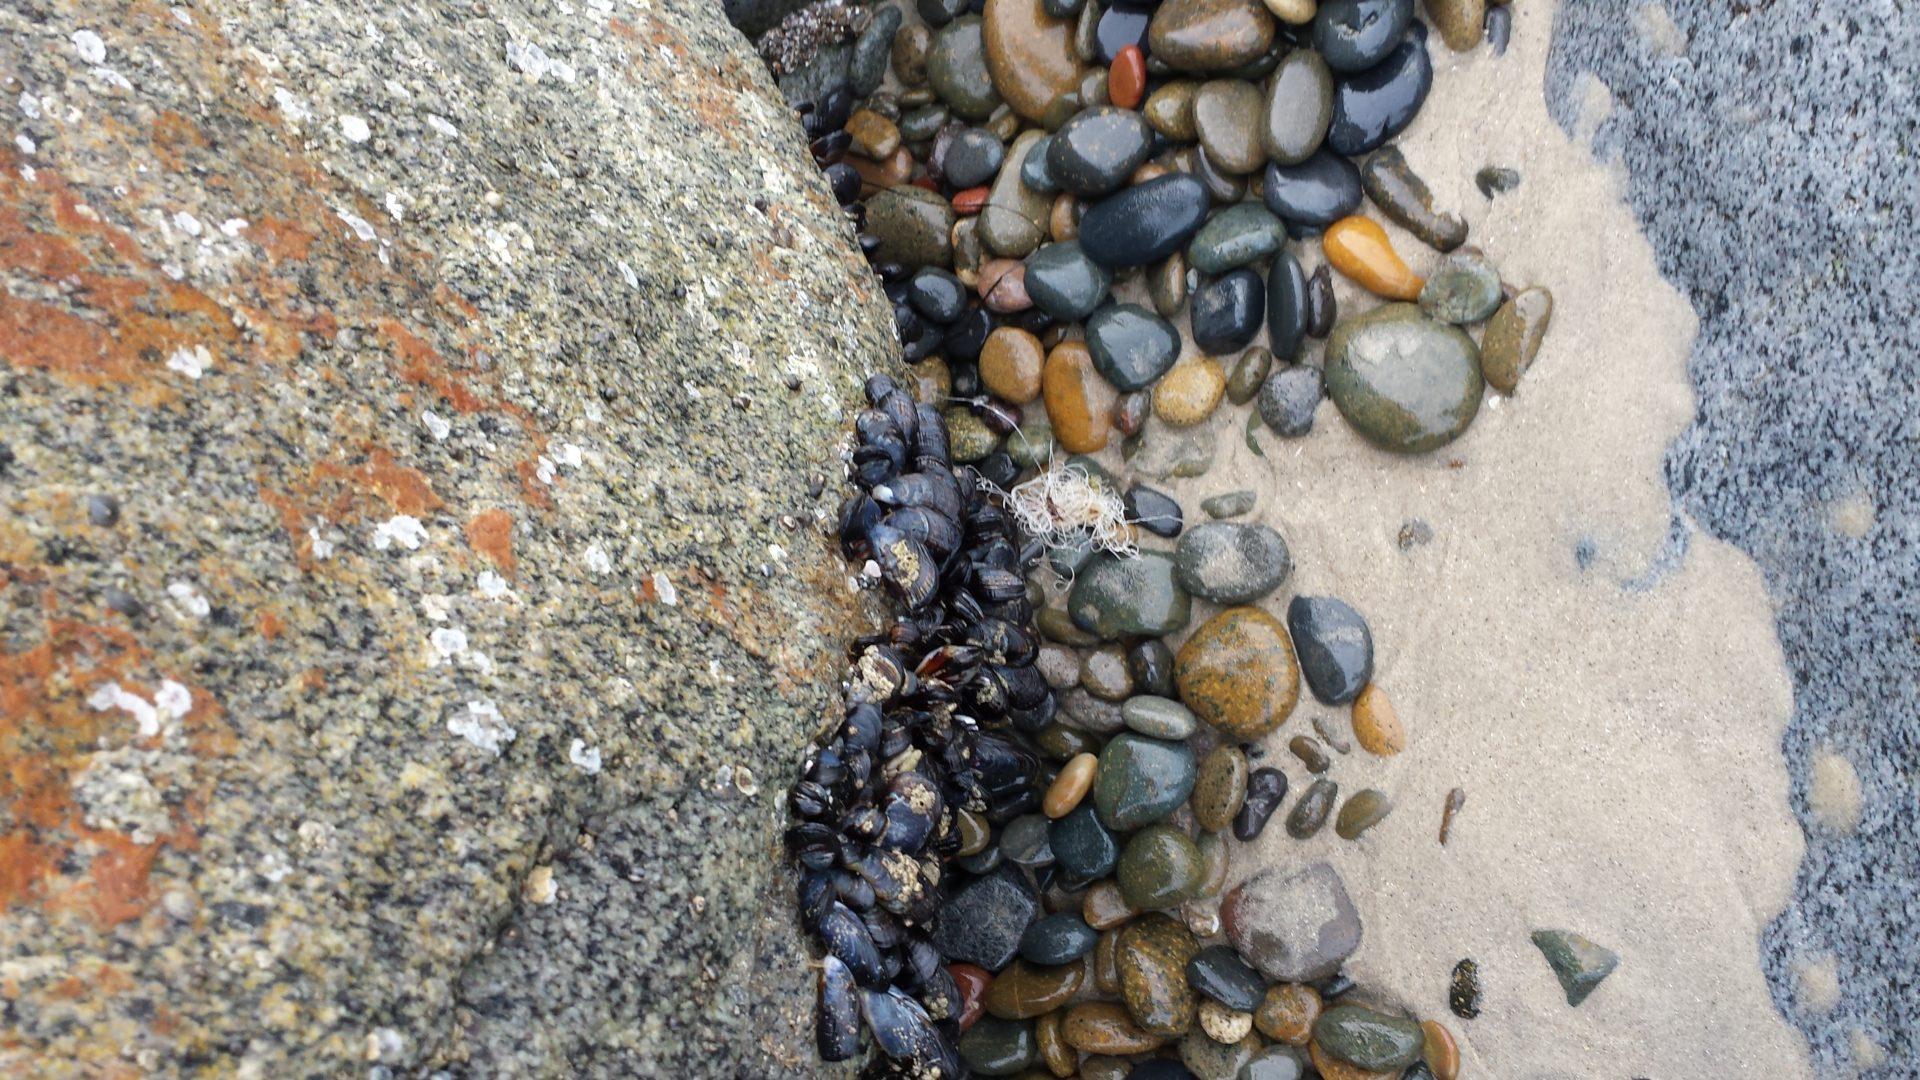 Rock, stone, sand